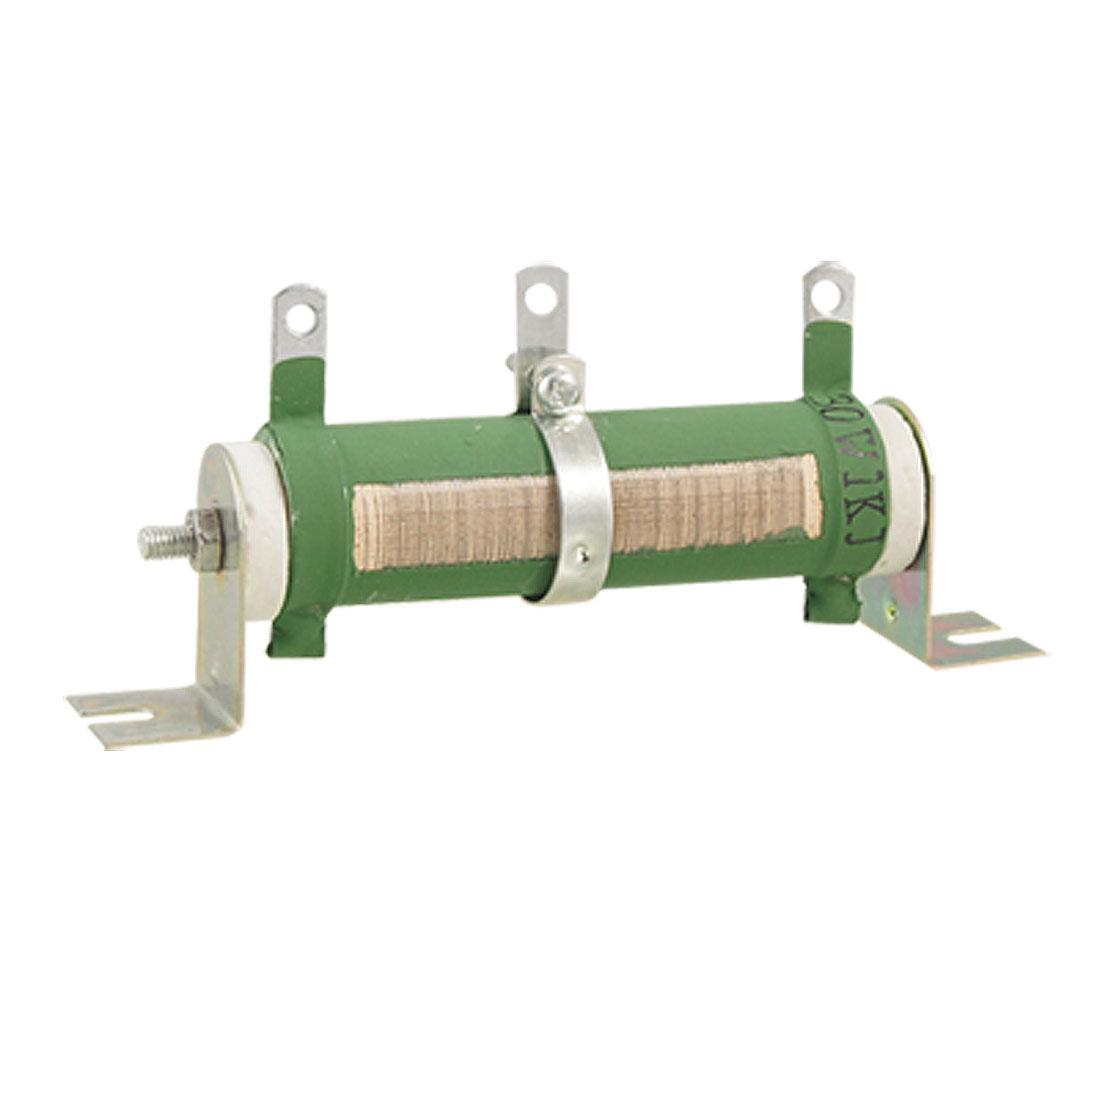 Ceramic Tubular Adjustable Resistor Rheostat 30W 1K Ohm 1KR